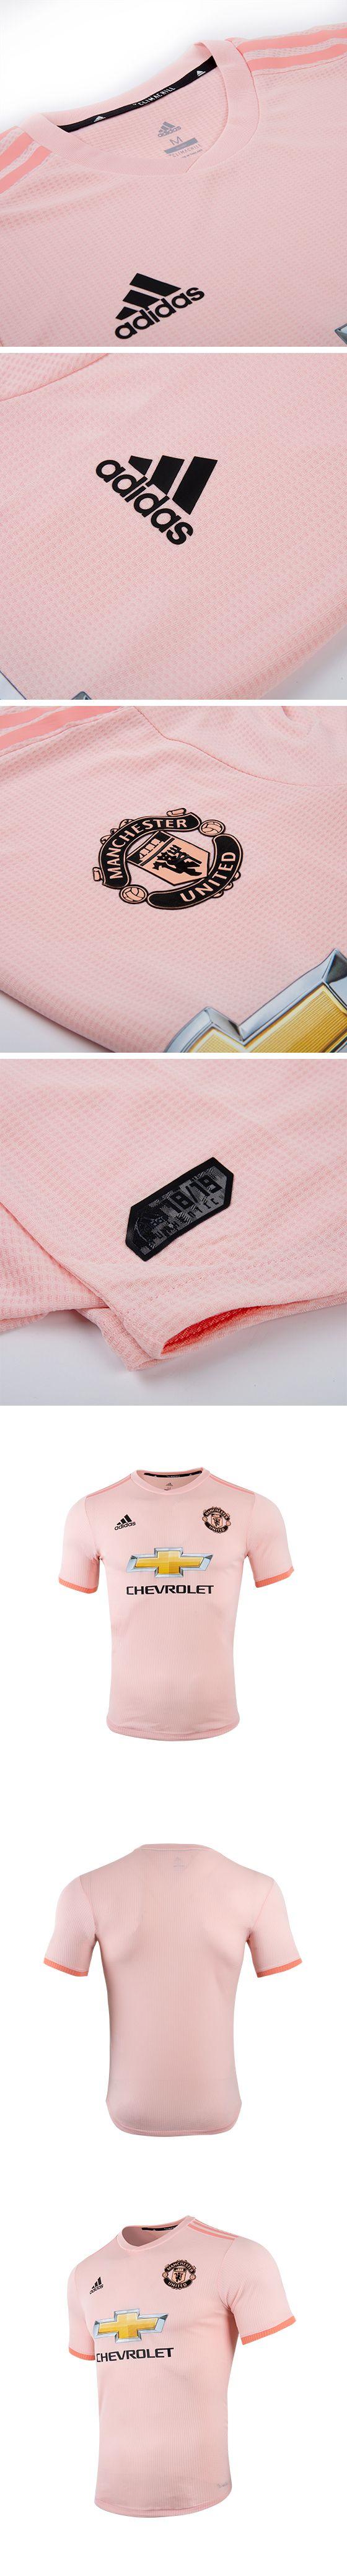 ac1bb22a48c 18-19 Manchester United Away Pink Jersey Shirt(Player Version ...